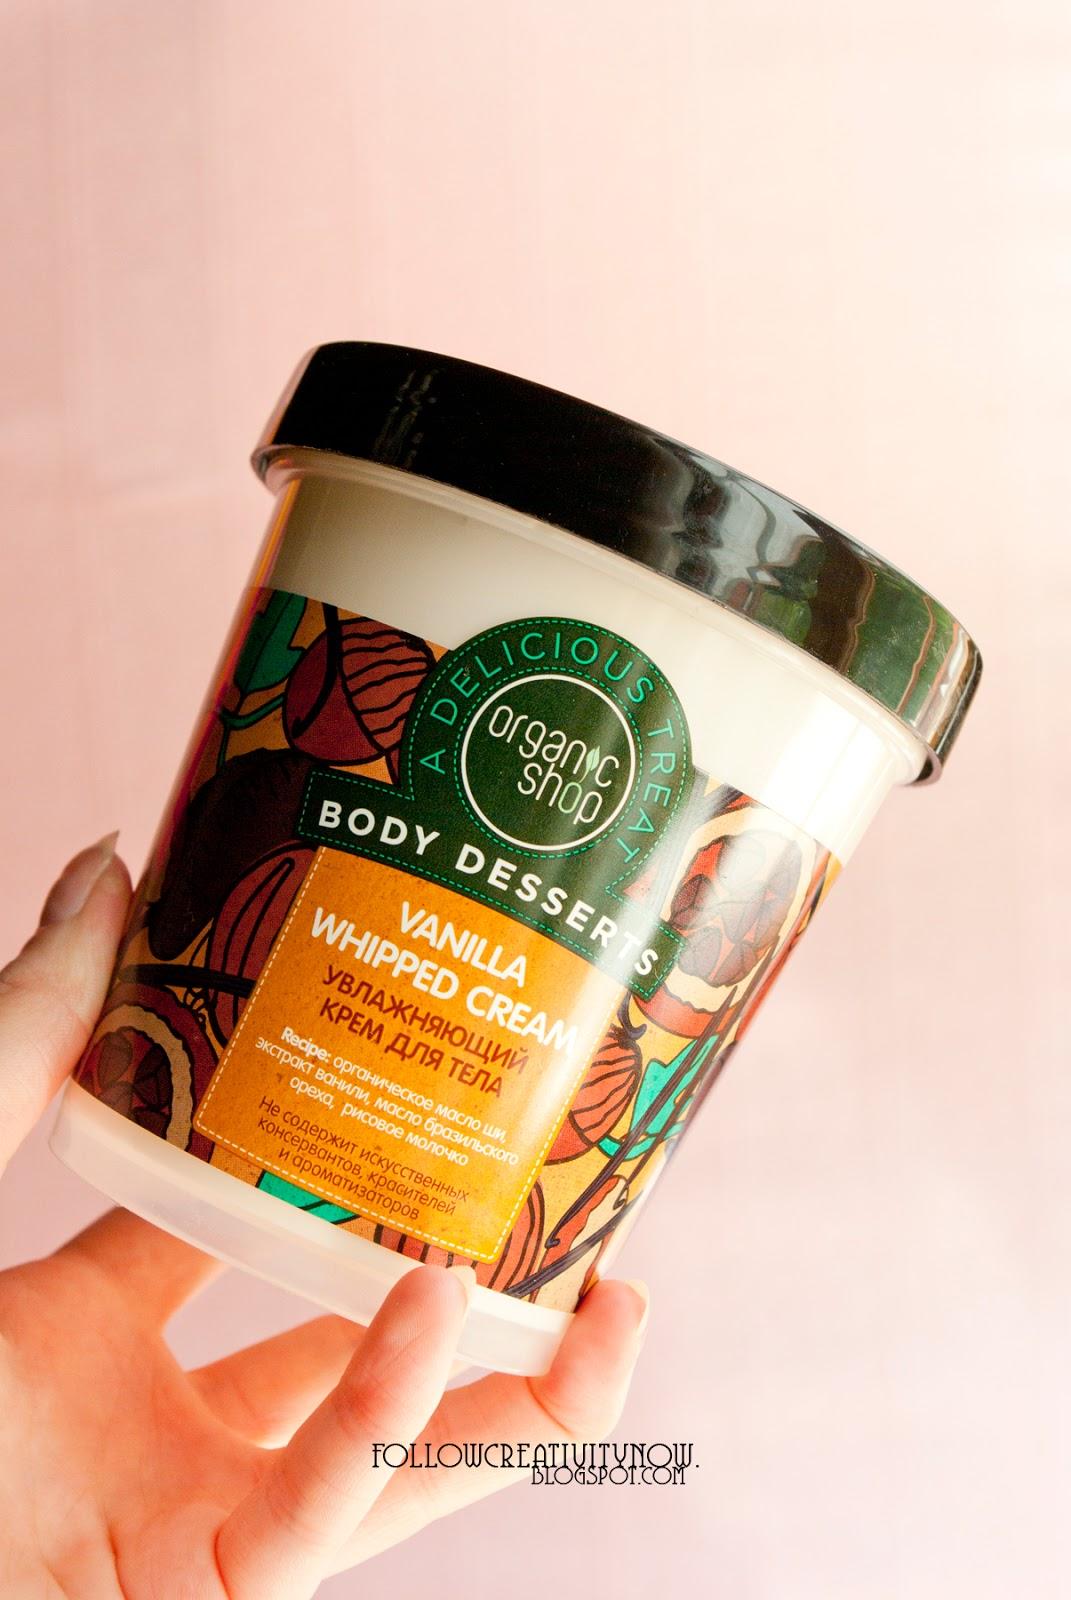 body desserts, vanilla whipped cream, organic shop